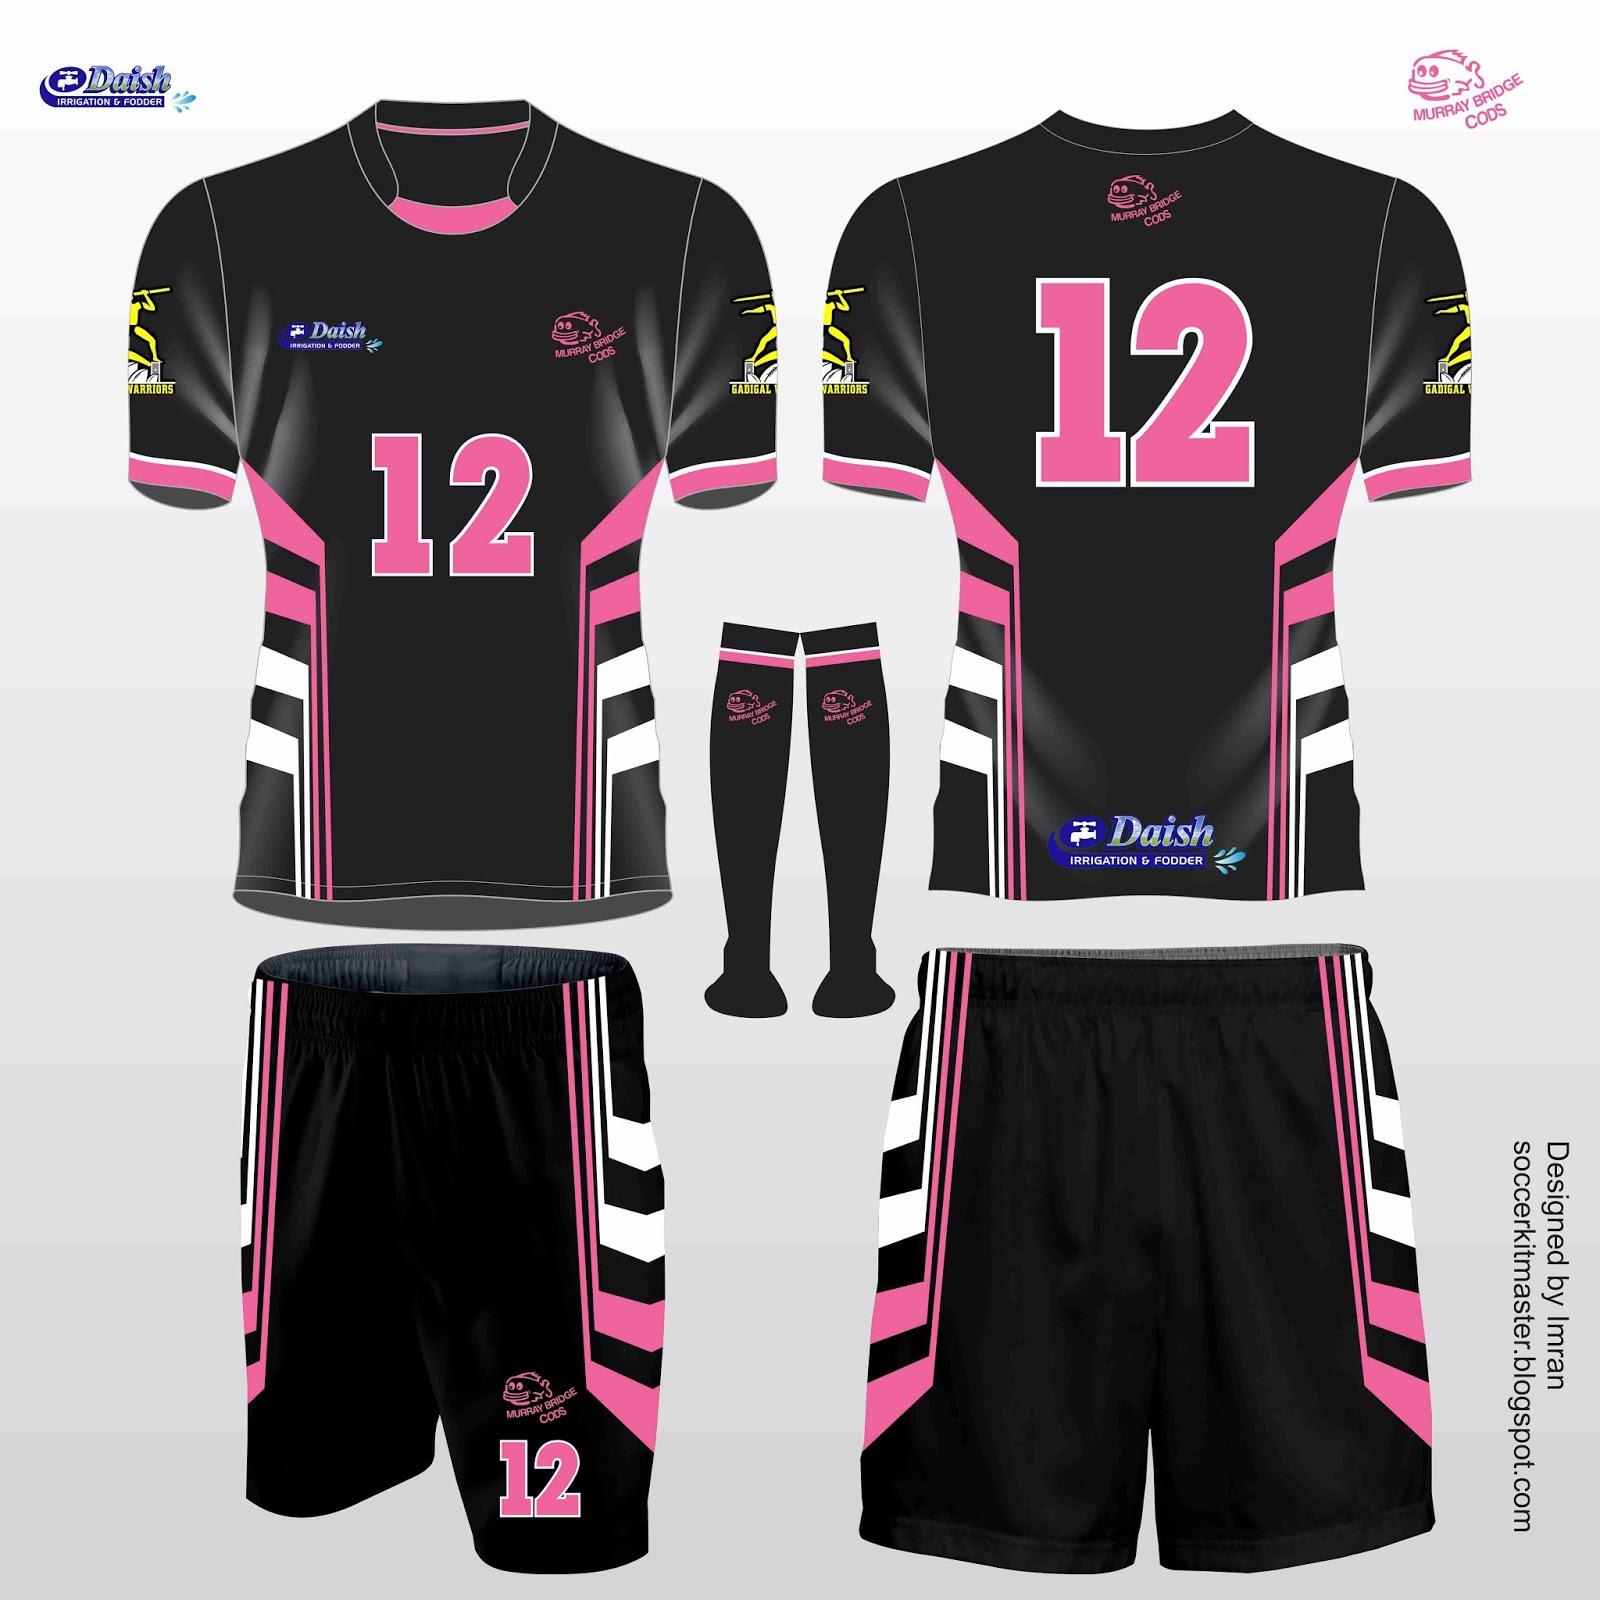 8541d8b8331 Football Kit Design Master